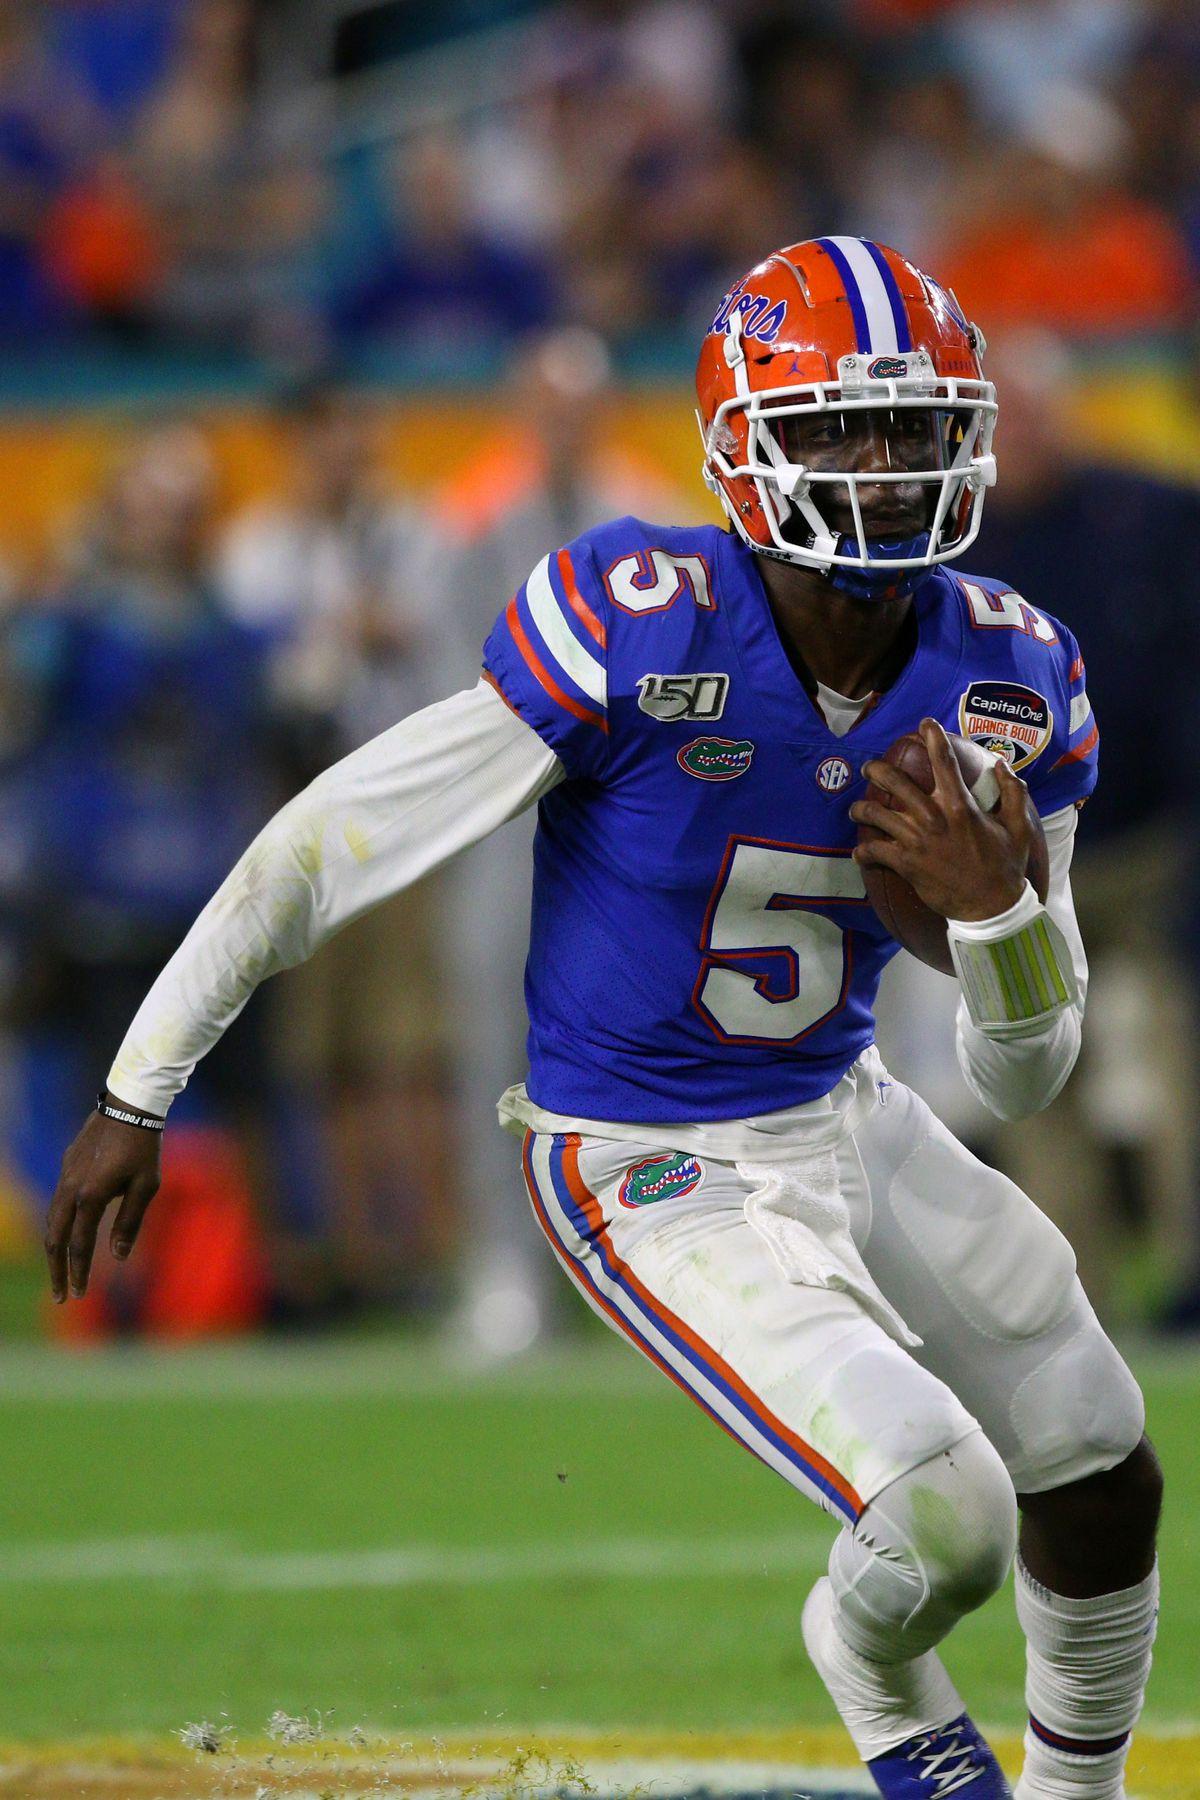 COLLEGE FOOTBALL: DEC 30 Orange Bowl - Florida v Virginia